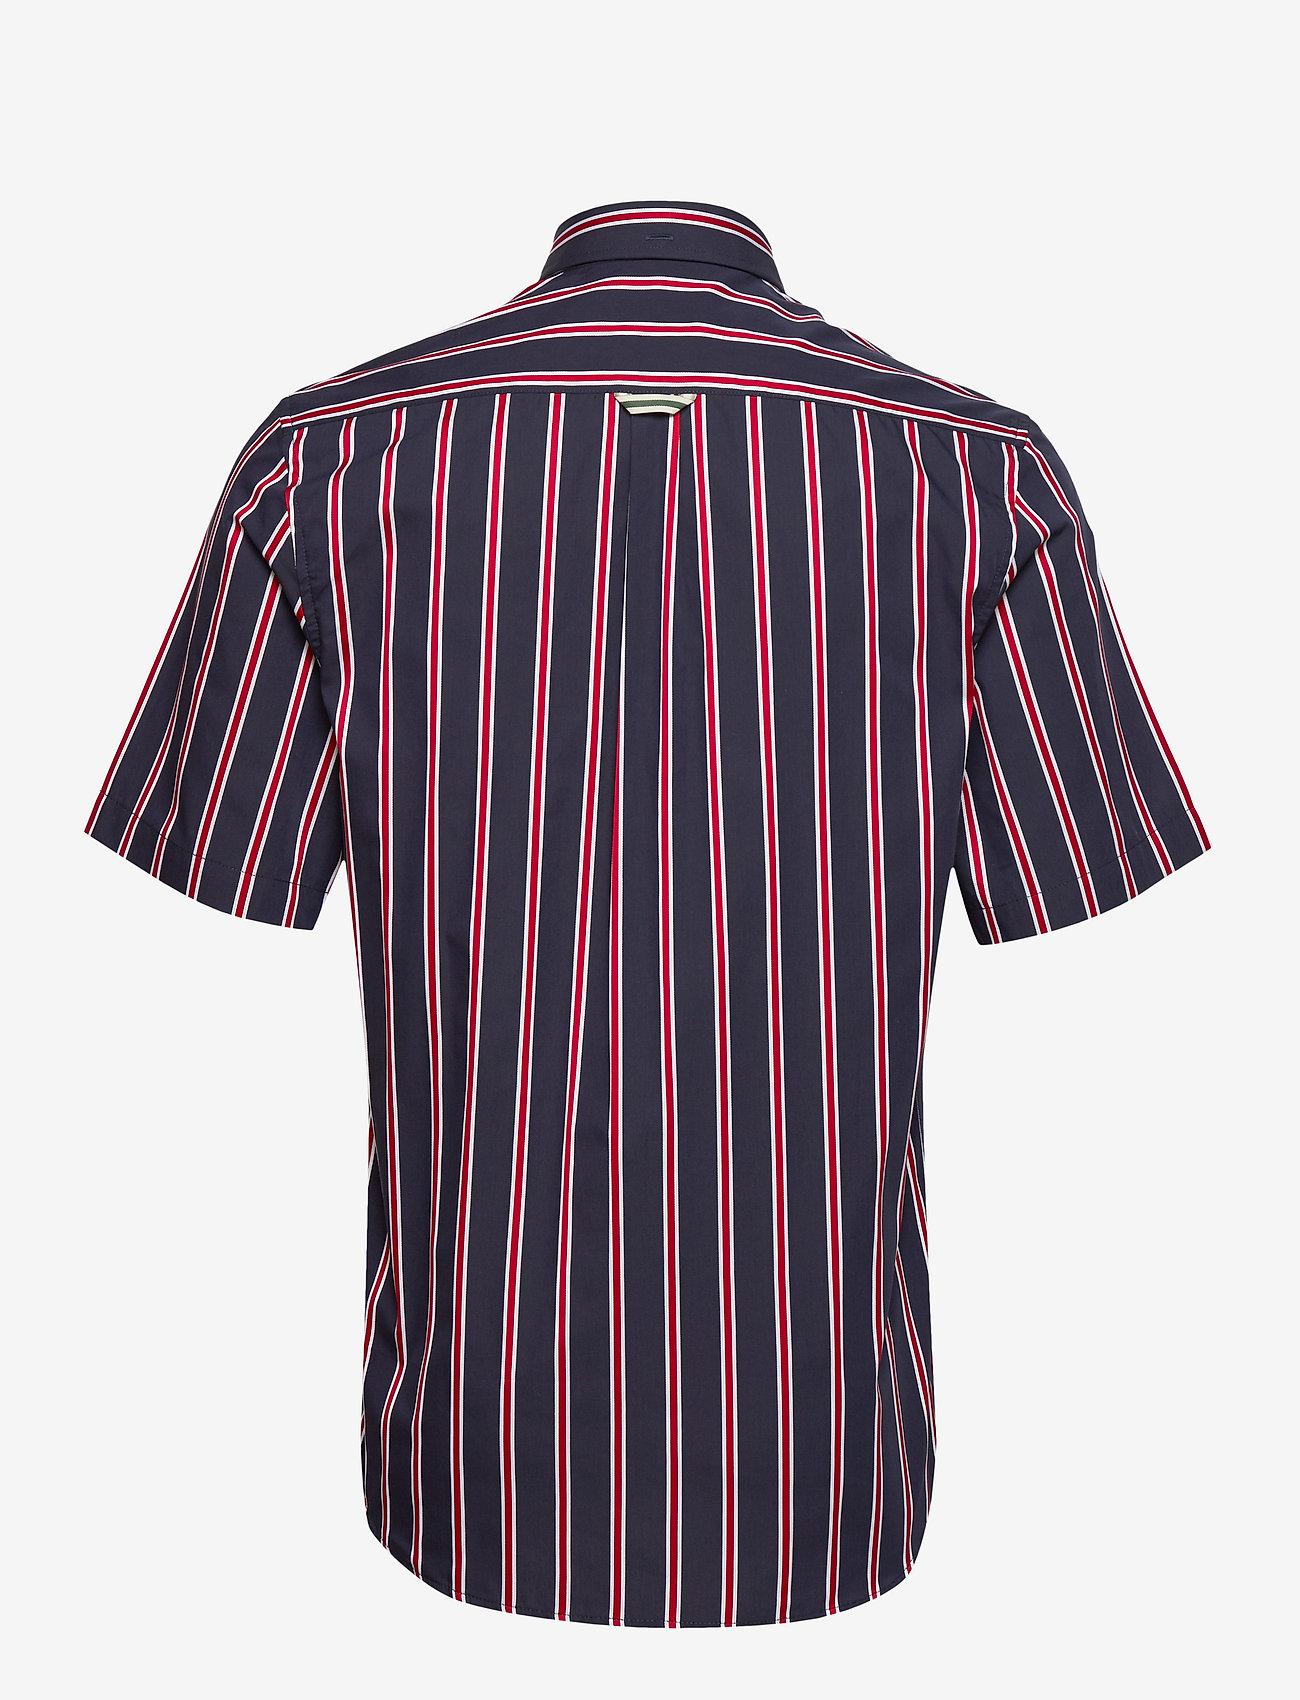 Forét MESA SHIRT - MIDNIGHT BLUE/RED - Skjorter MIDNIGHT BLUE/RED - Menn Klær